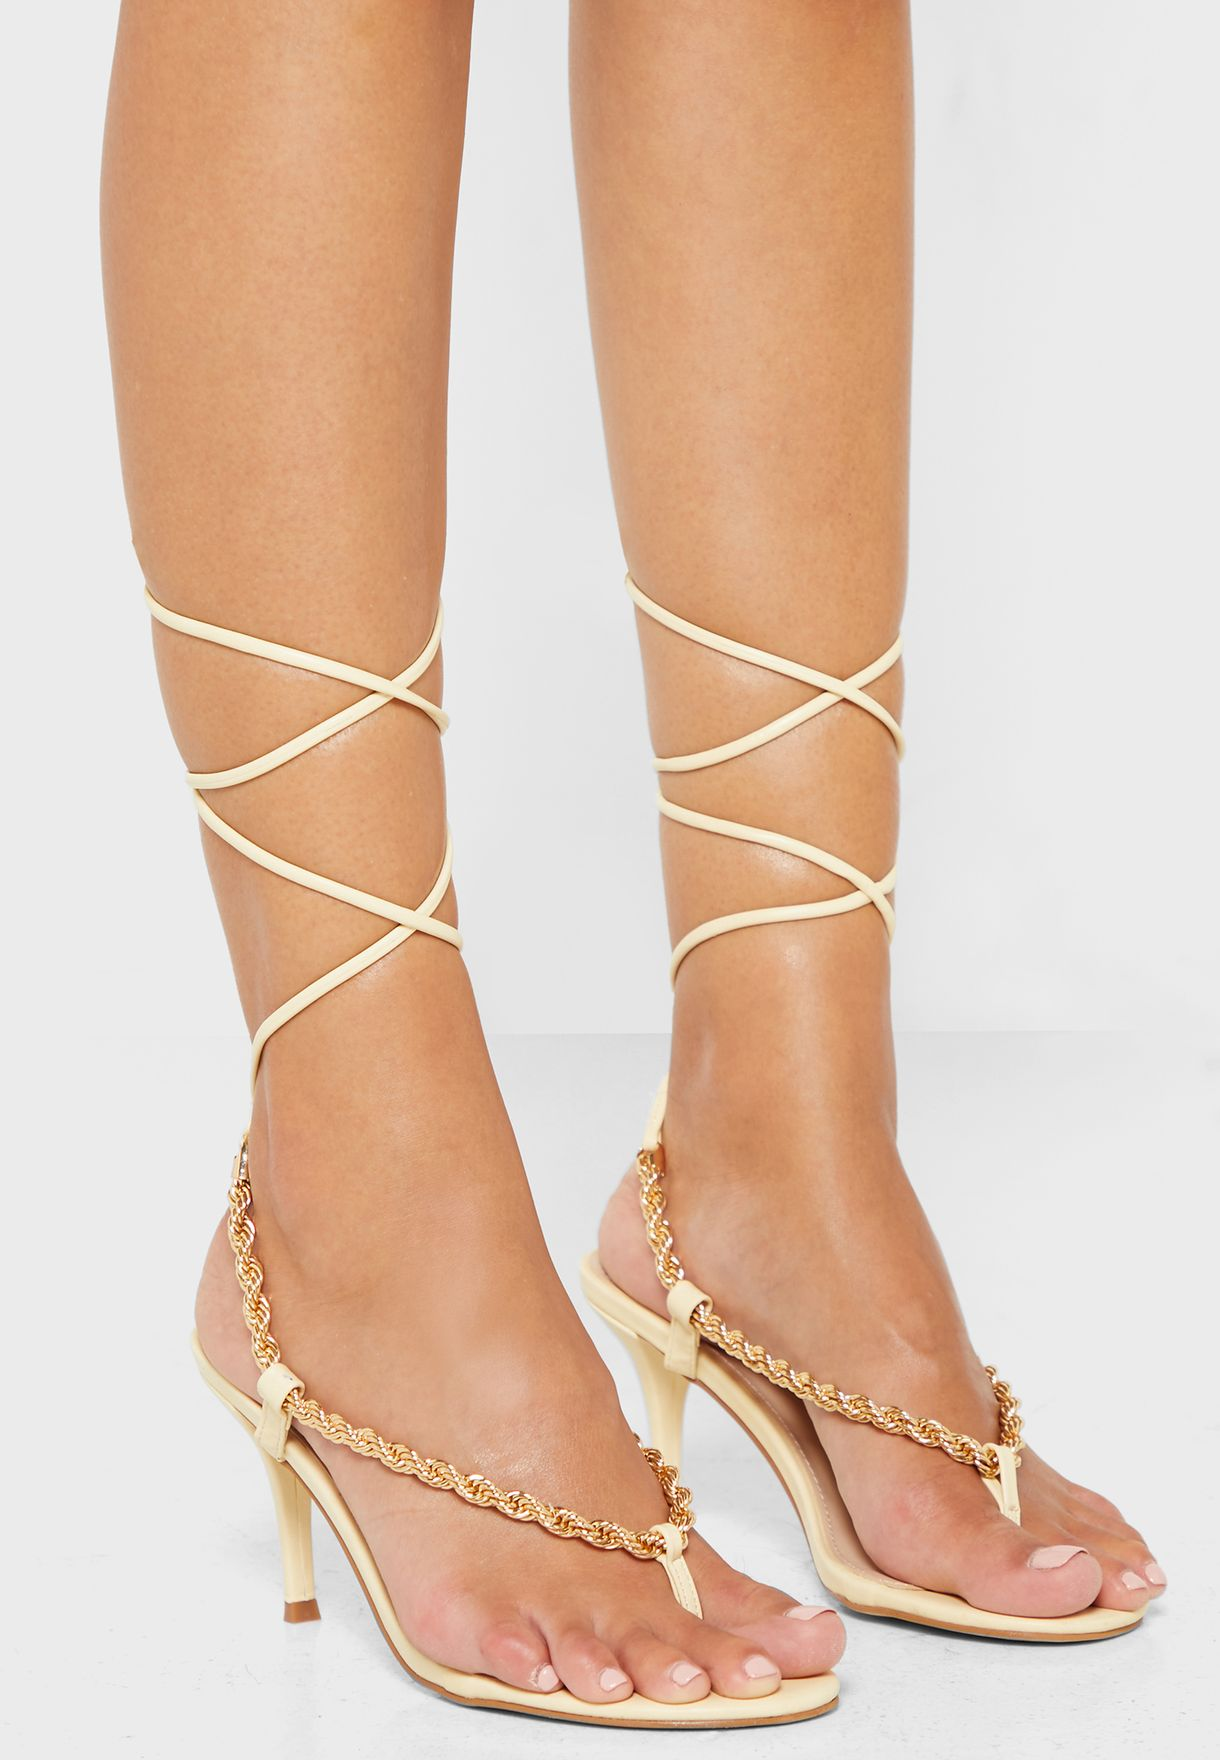 Amarlie Vanilla Pu Chain Toe Thong Lace Up Heel